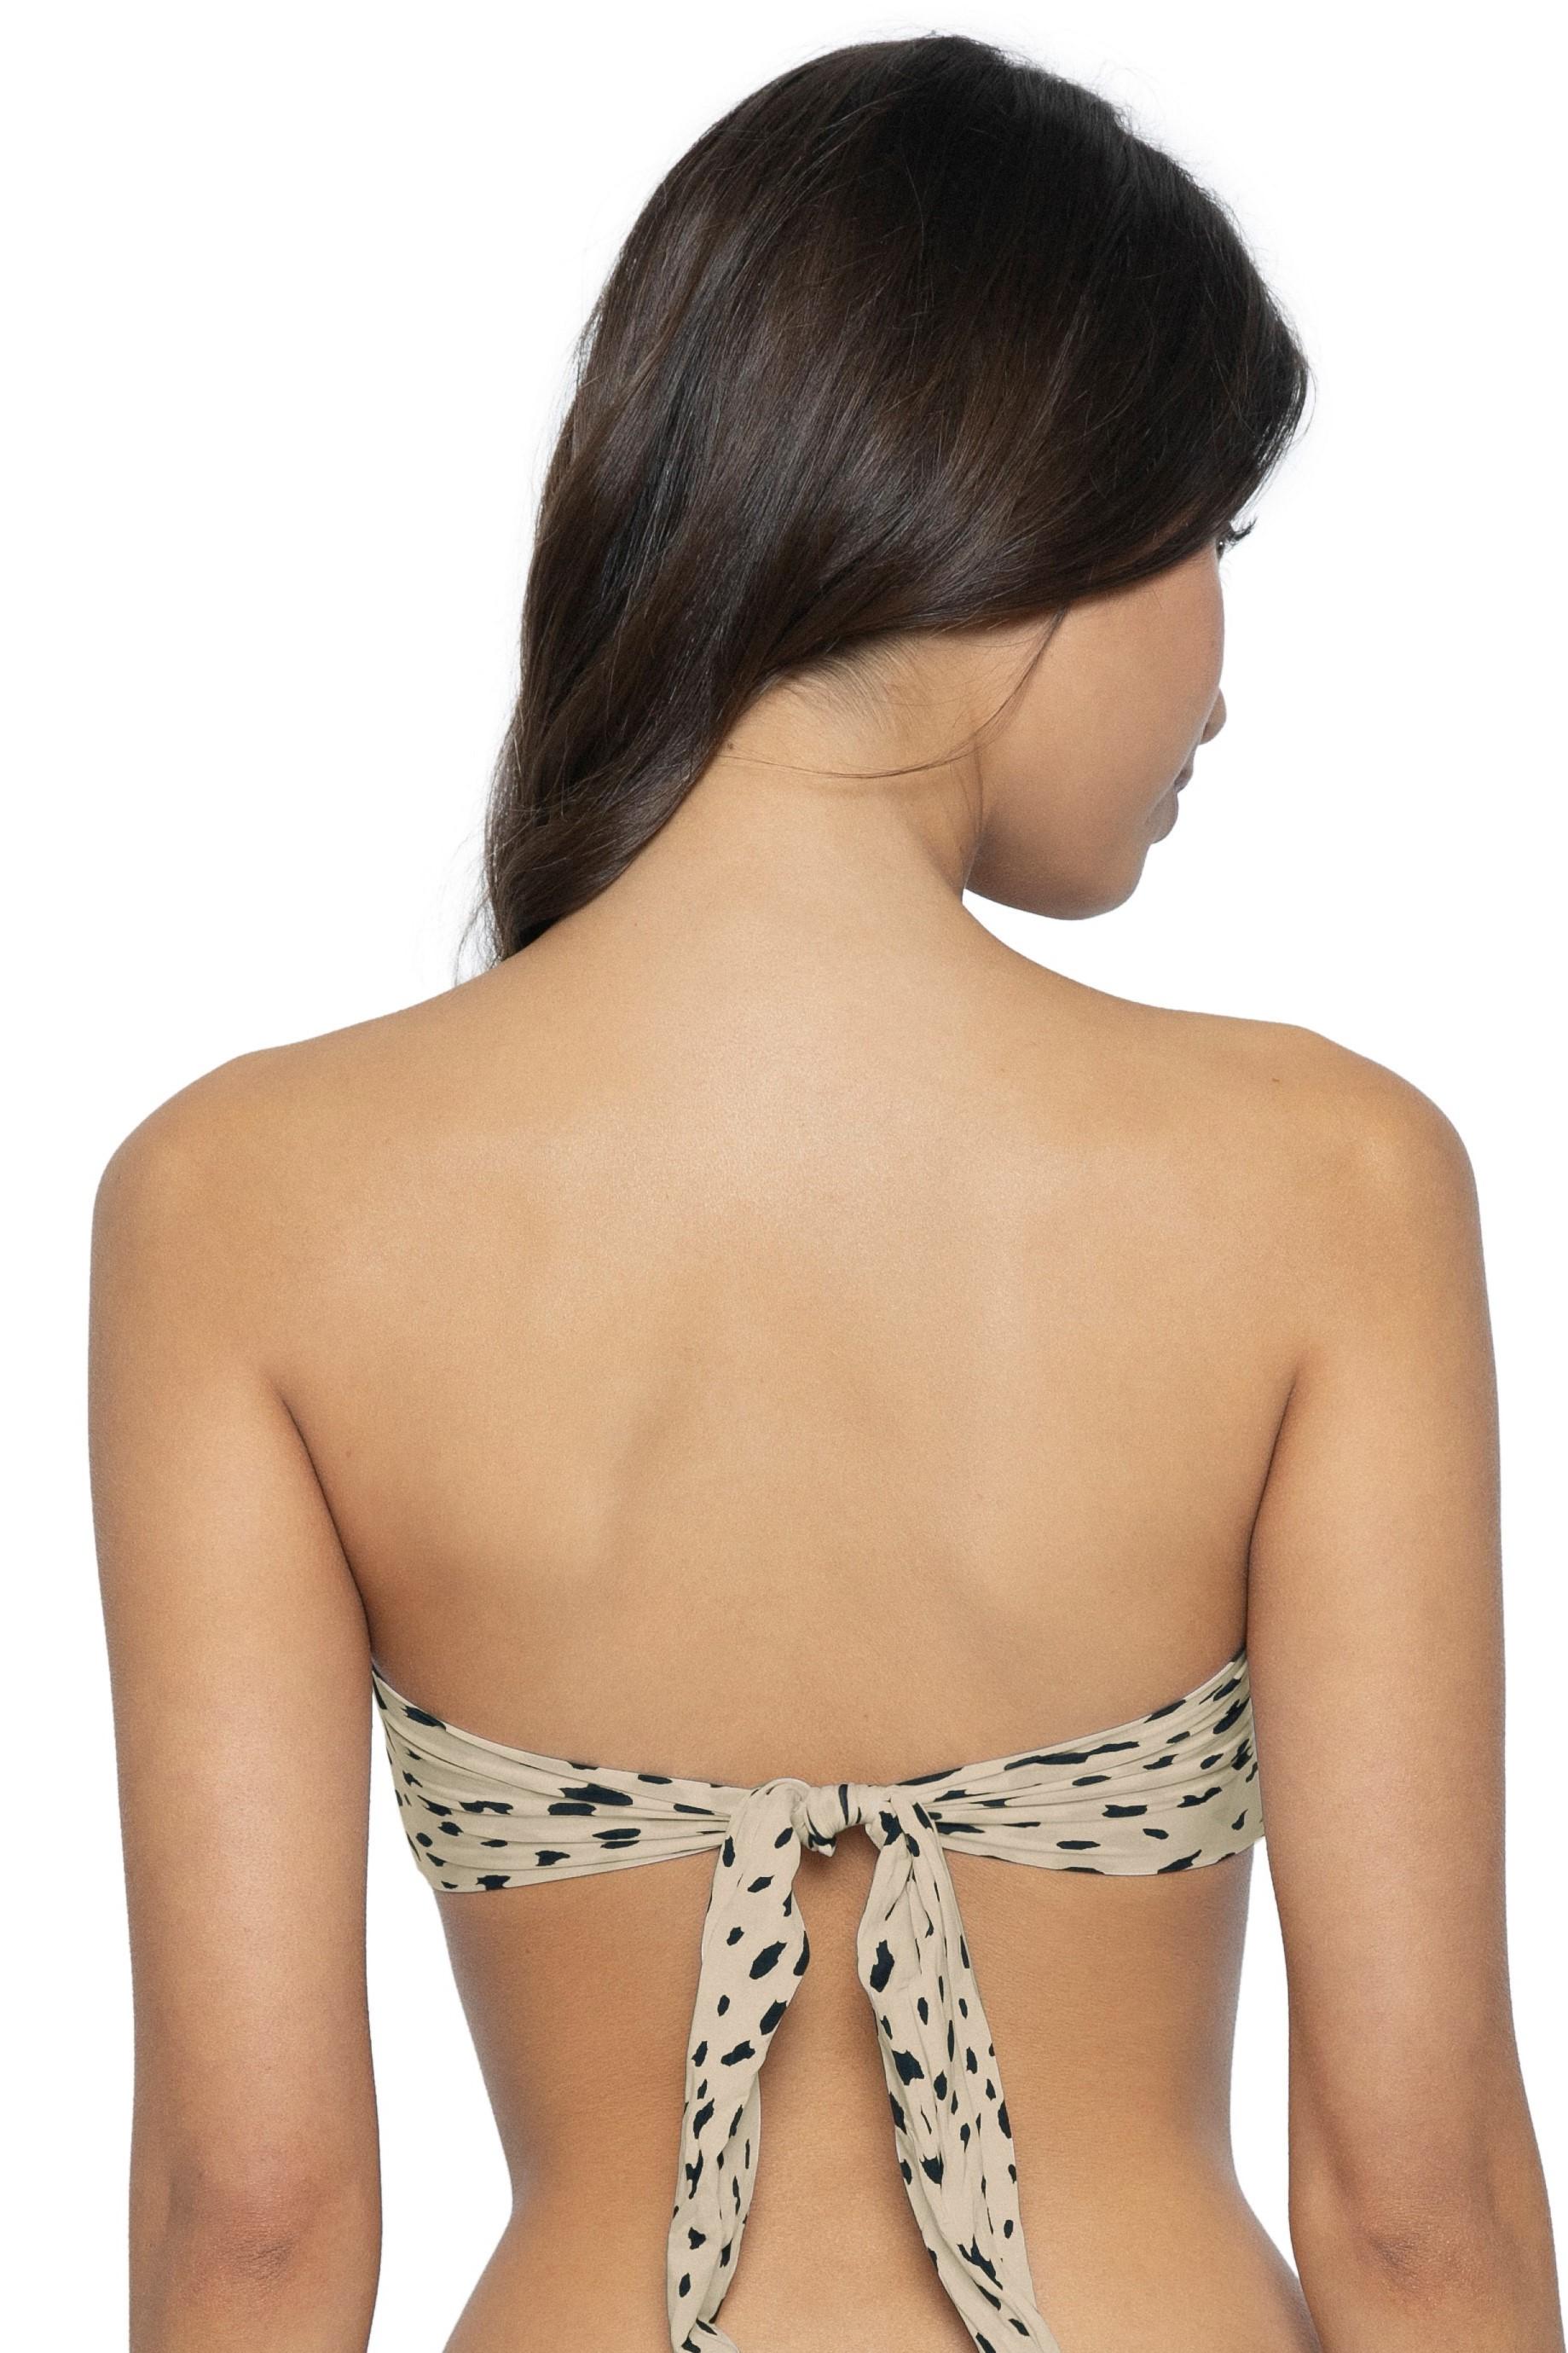 Pilyq  Swim  Wild Heart Color Block Bandeau Bikini Top